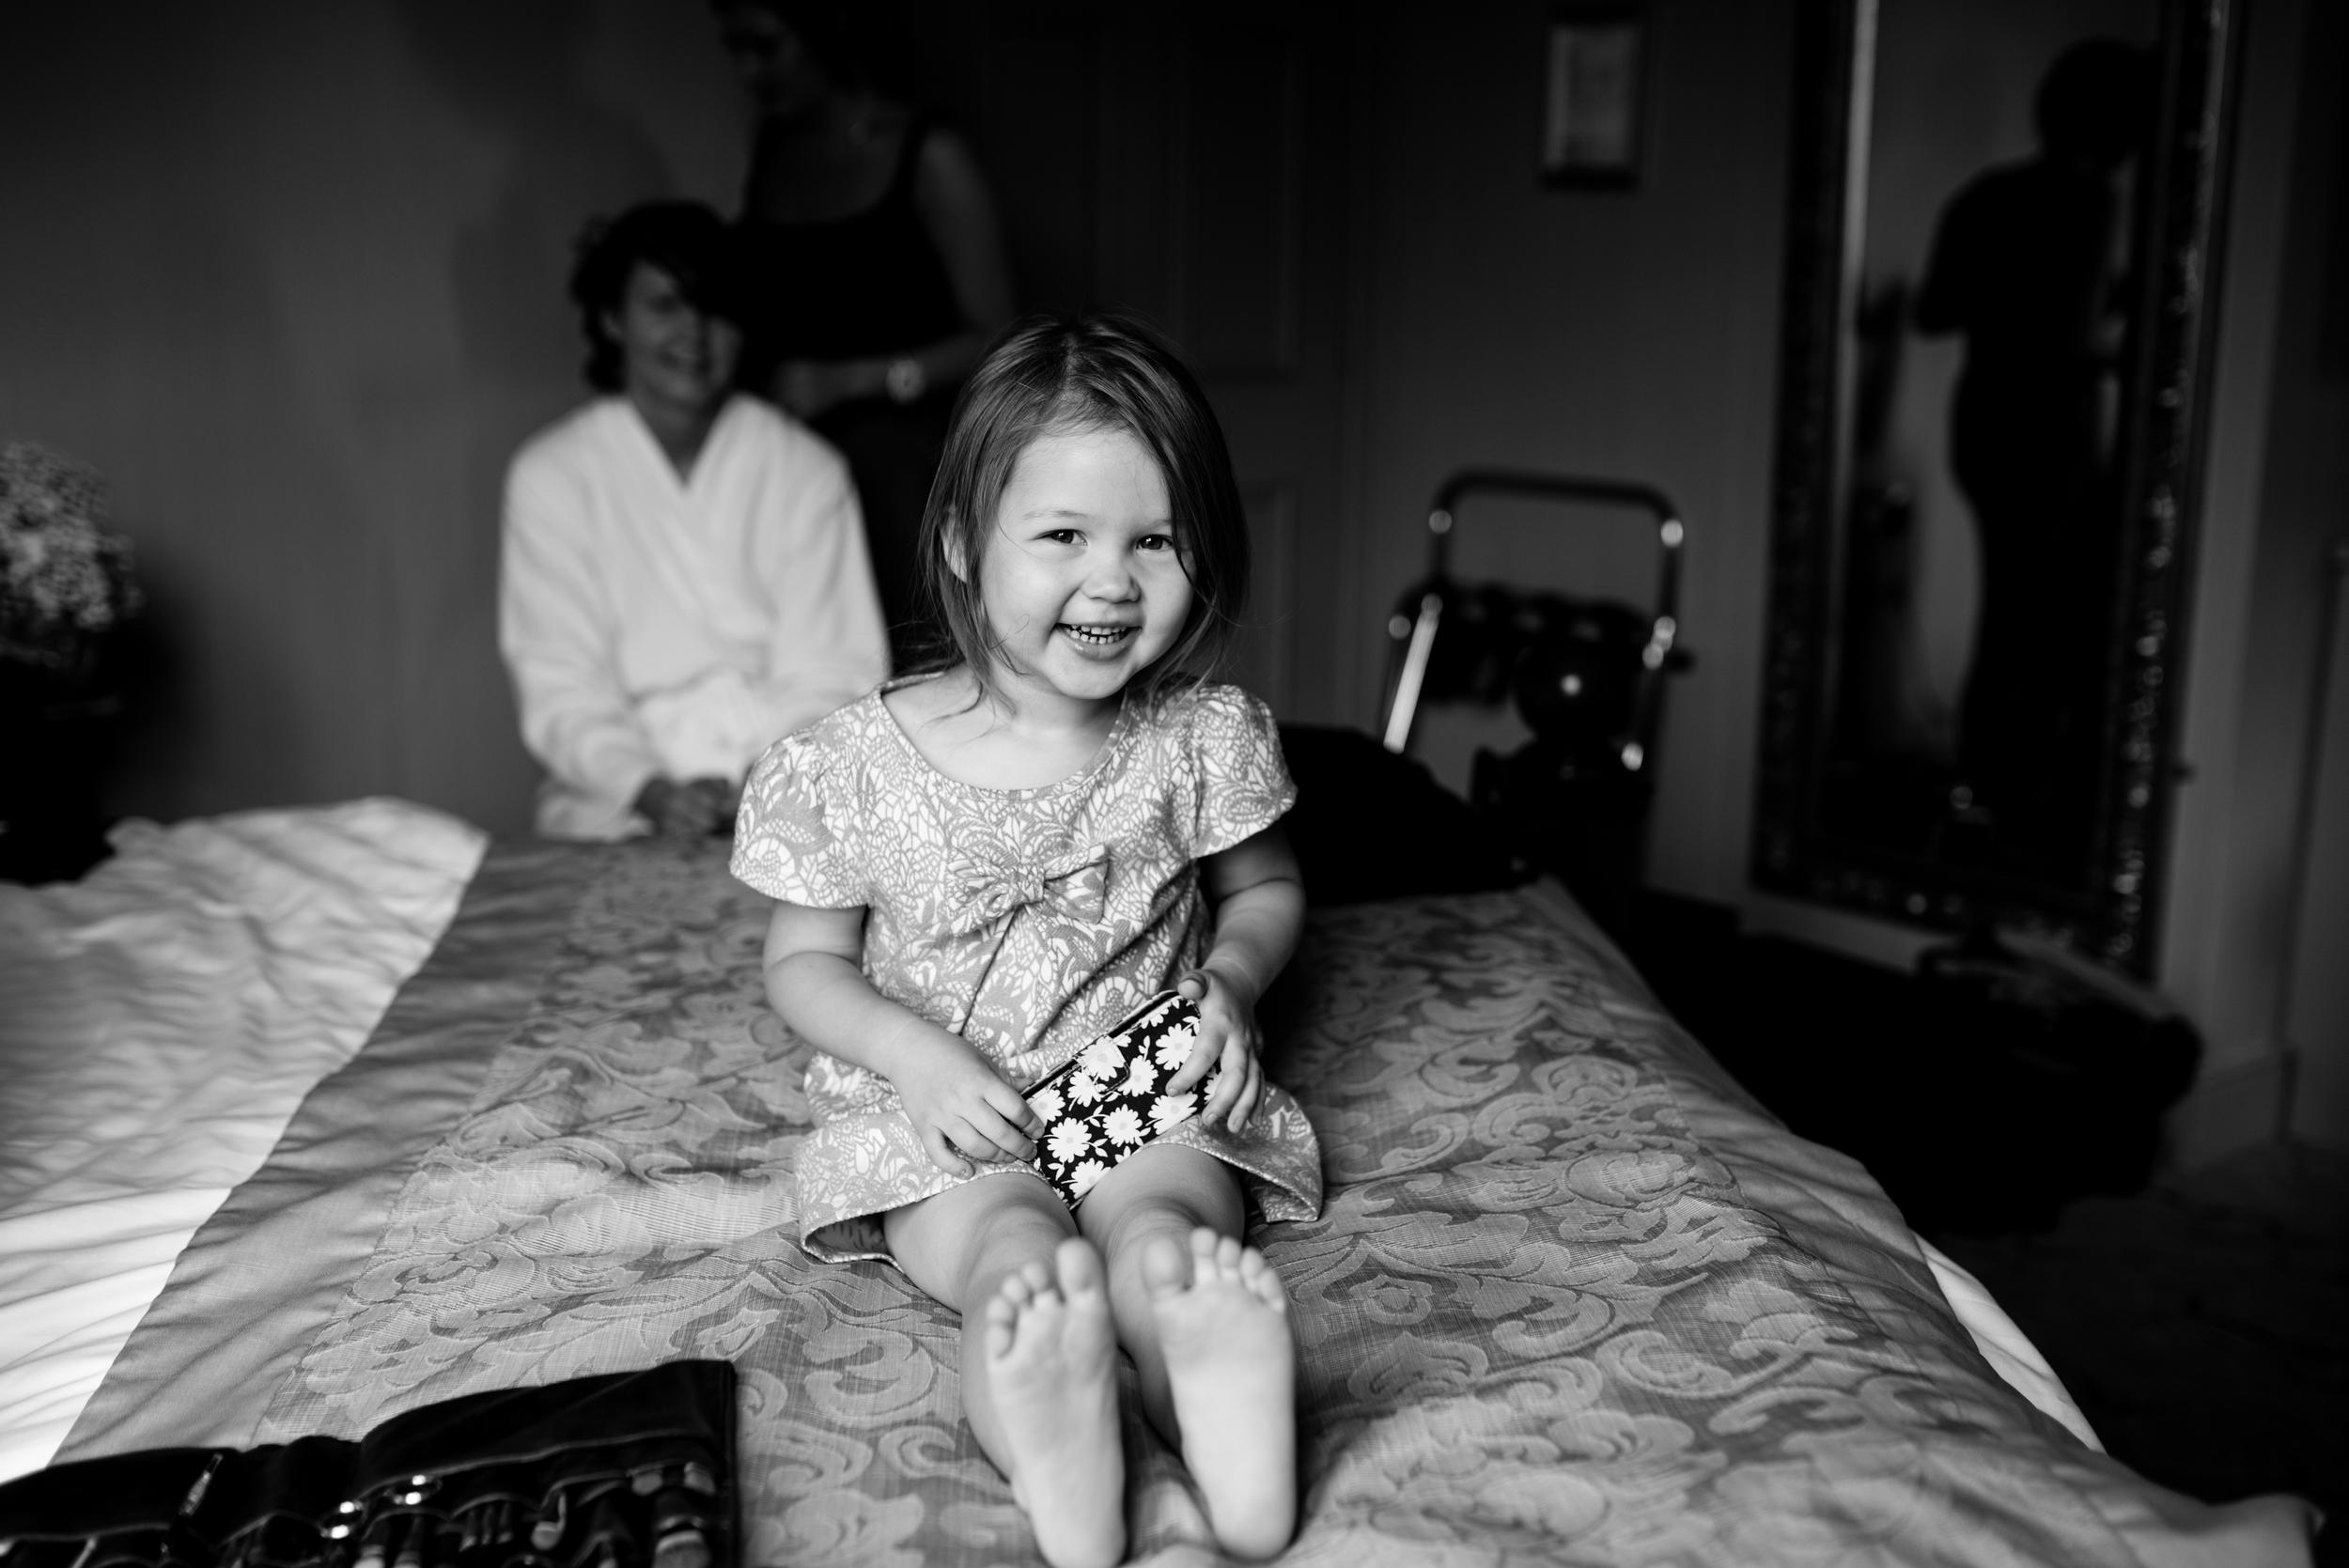 Daughter_of_the_bride_The_Old_Inn_Crawfordsburn